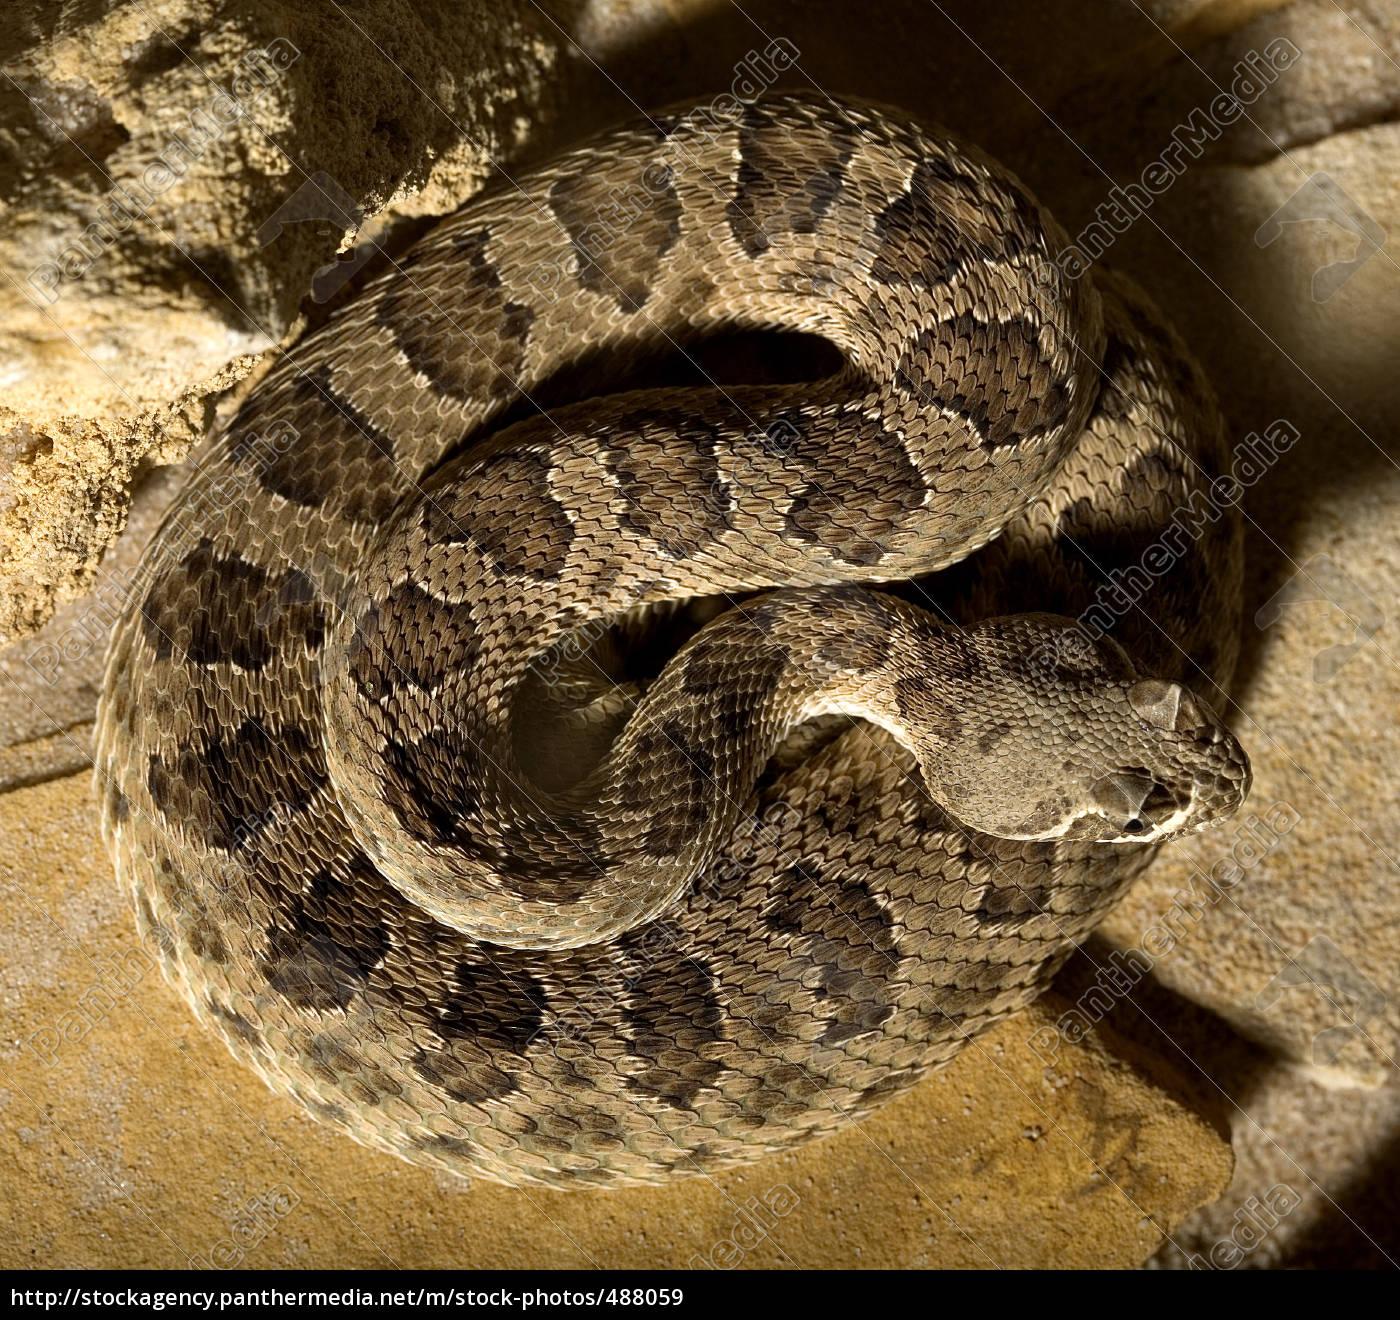 Stock Photo 488059 - rattlesnake